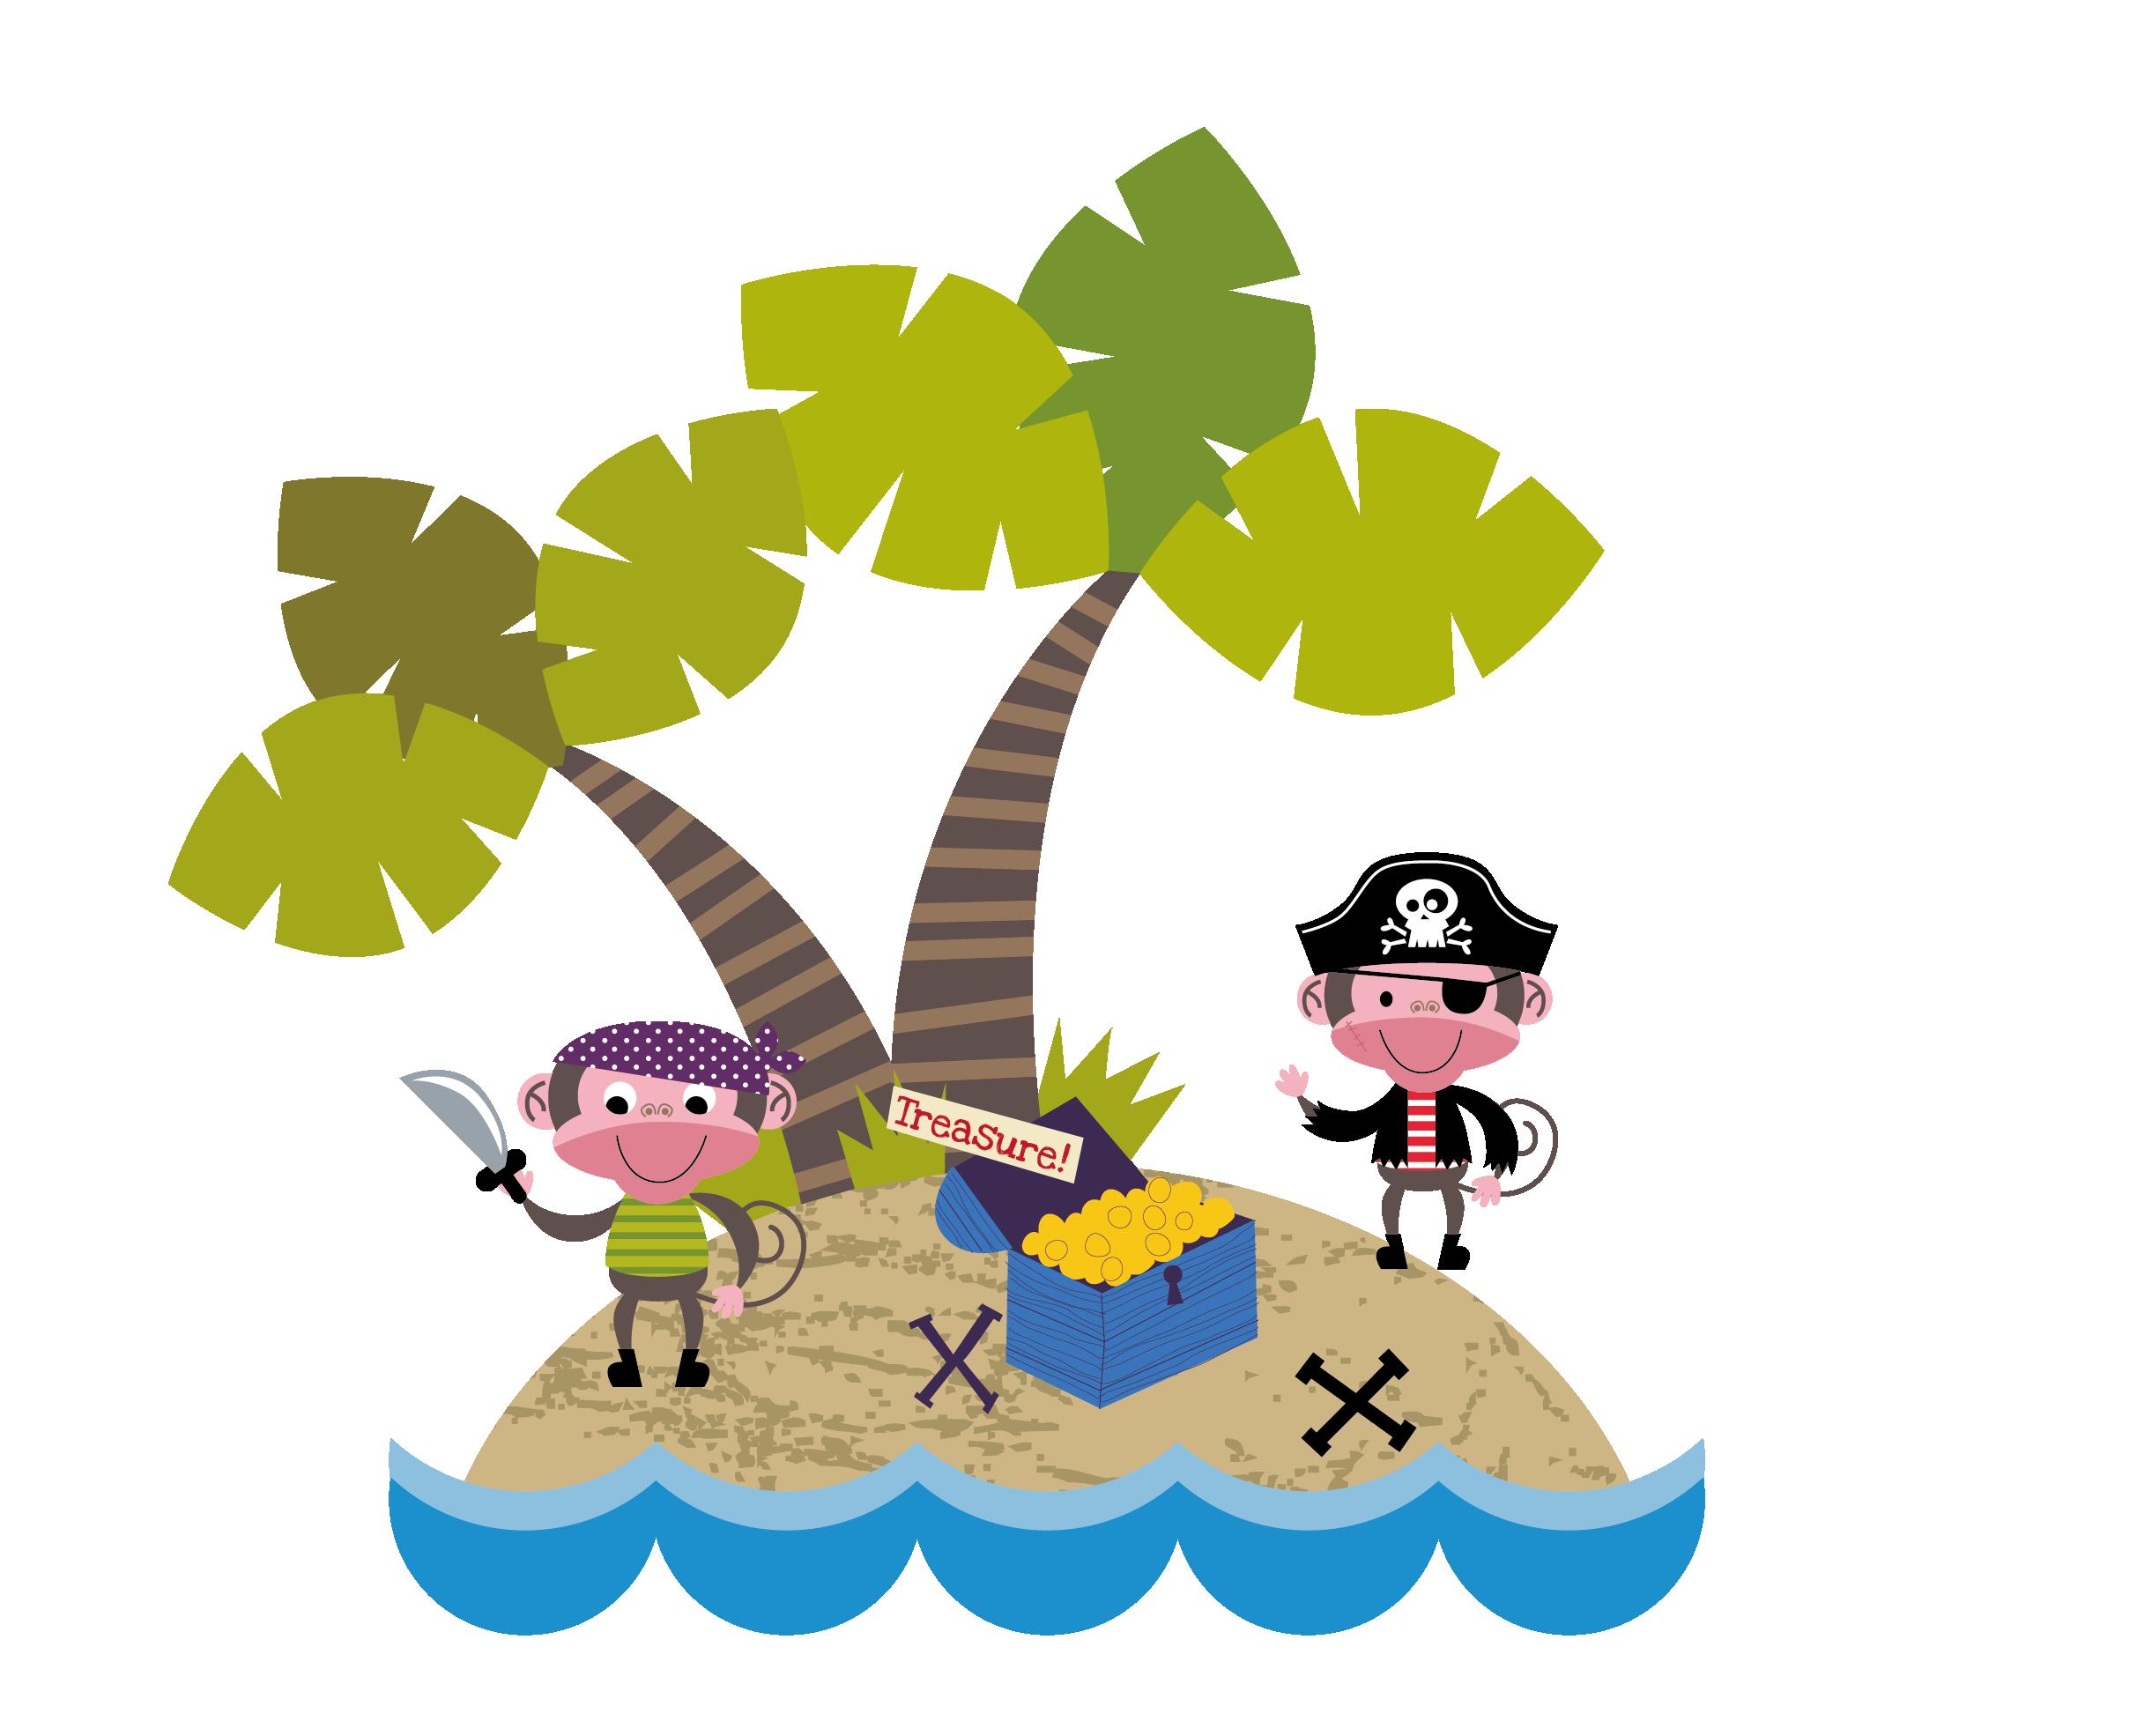 Treasure clipart pirate island. Cartoon piracy transprent png